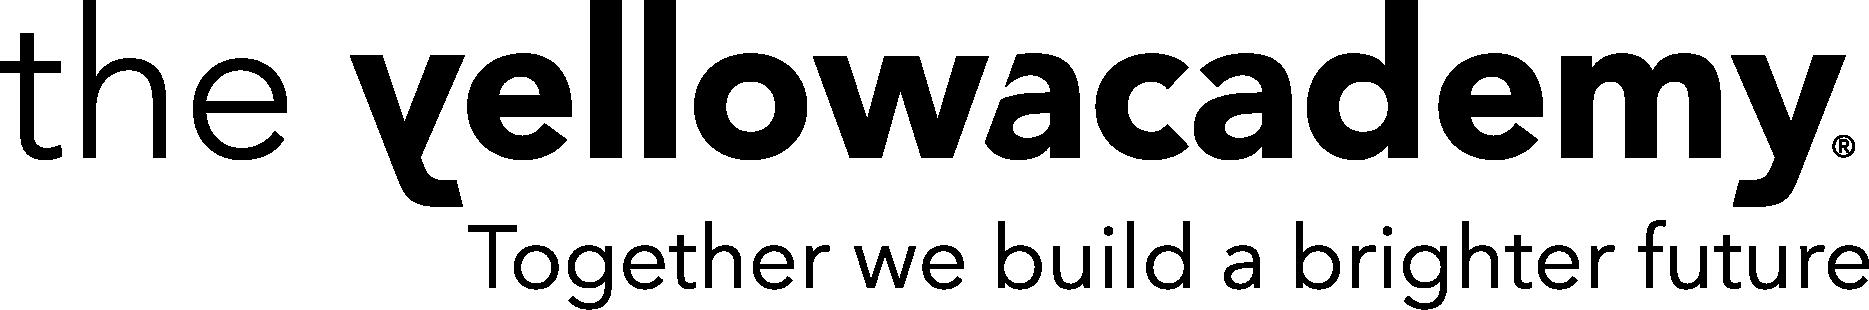 letterbeeld & slogan